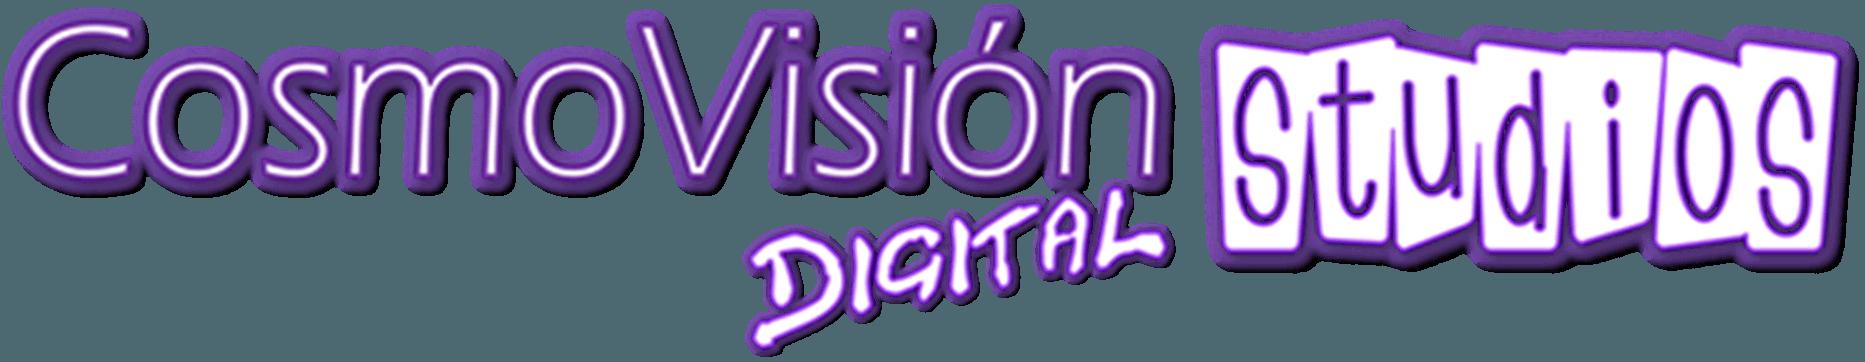 CosmoVision-Digital